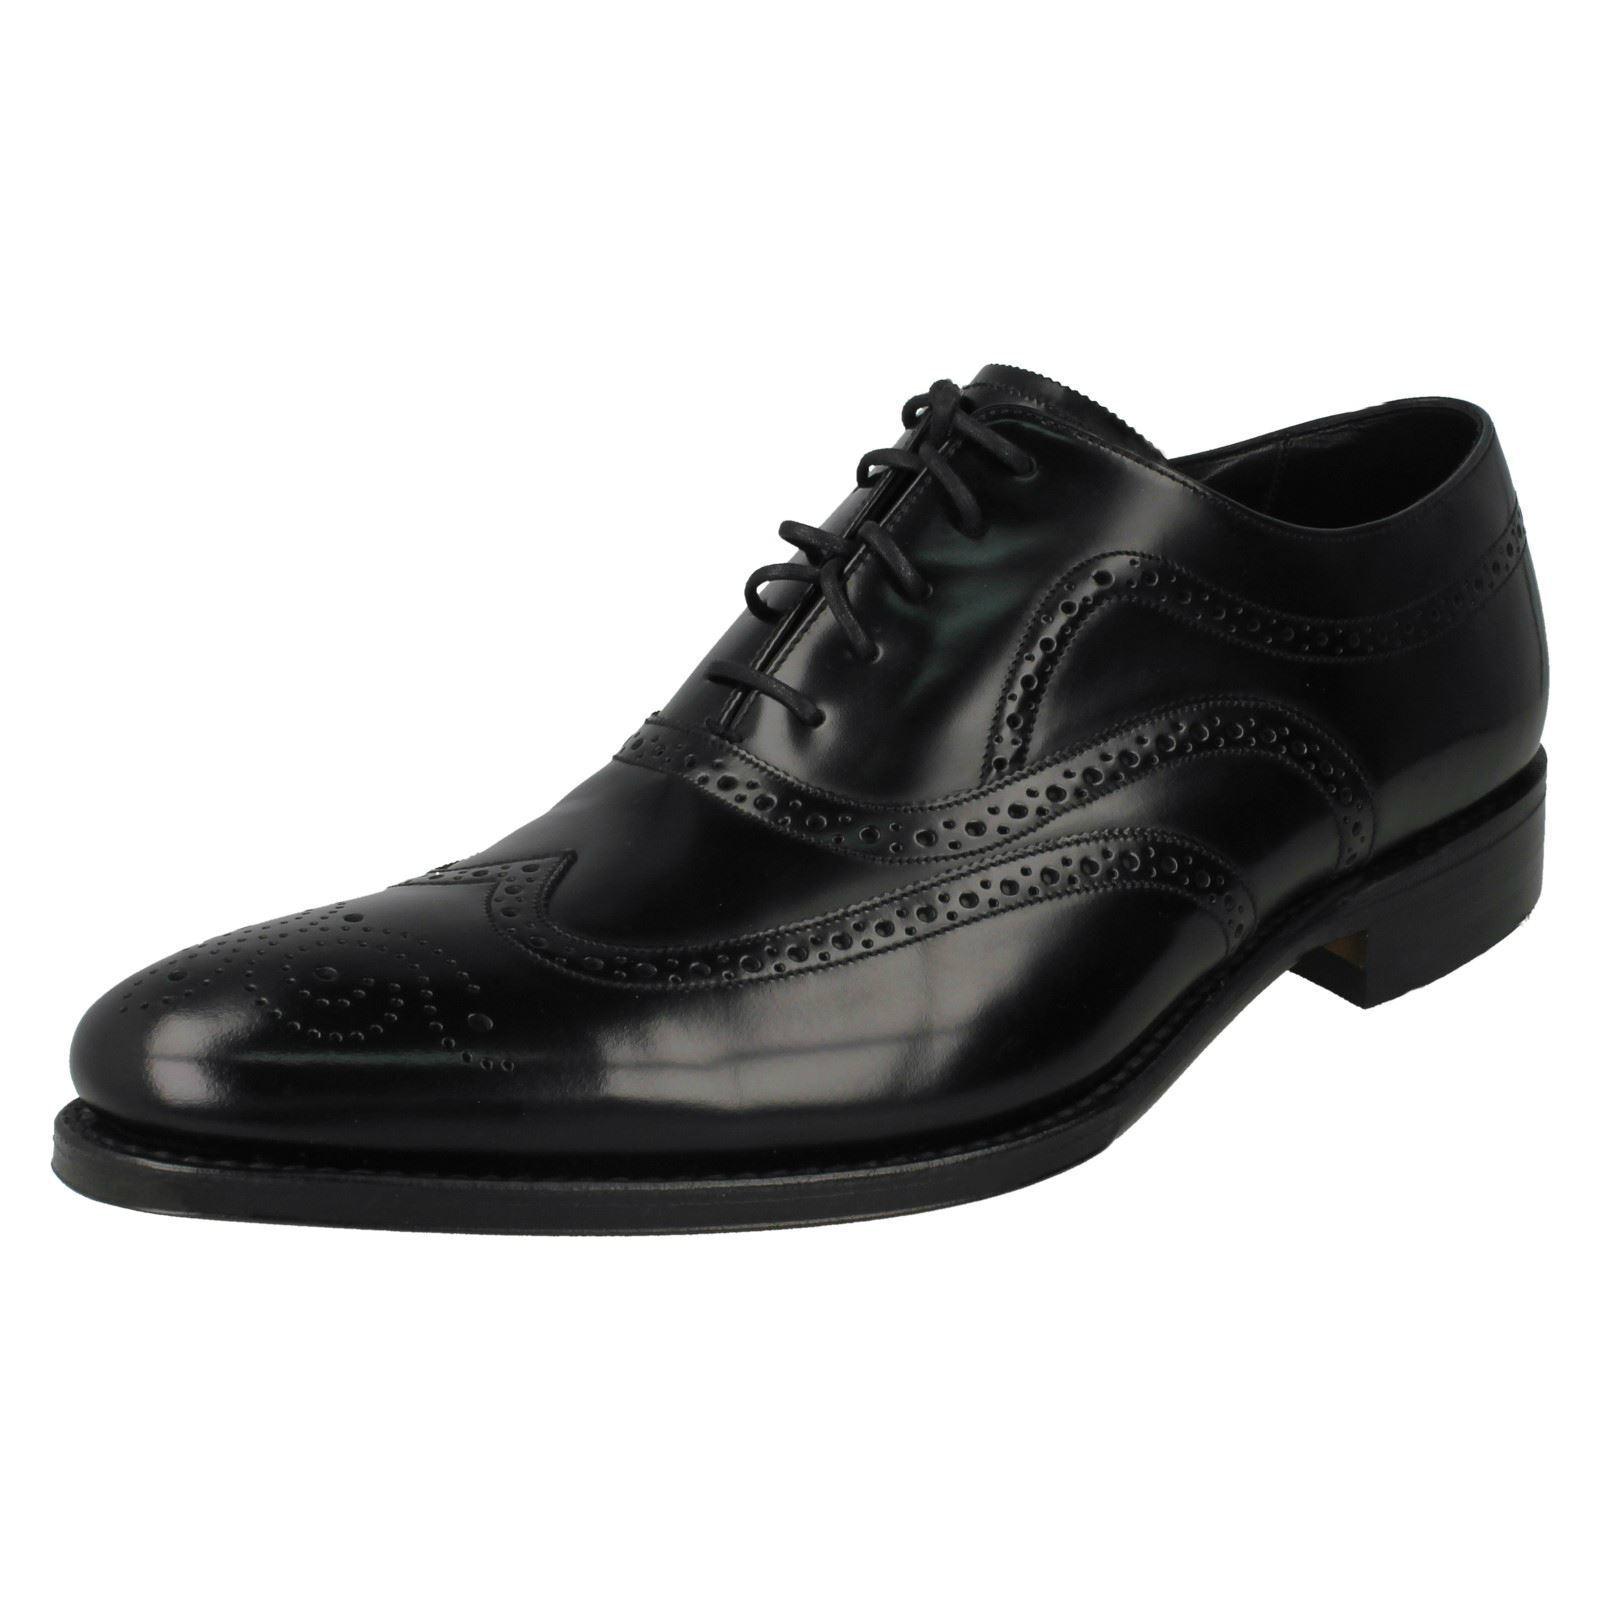 Herren Herren Herren Loake Lace Up Smart/Formal Polished Leder Narrow Fit Schuhes Jones e63ace